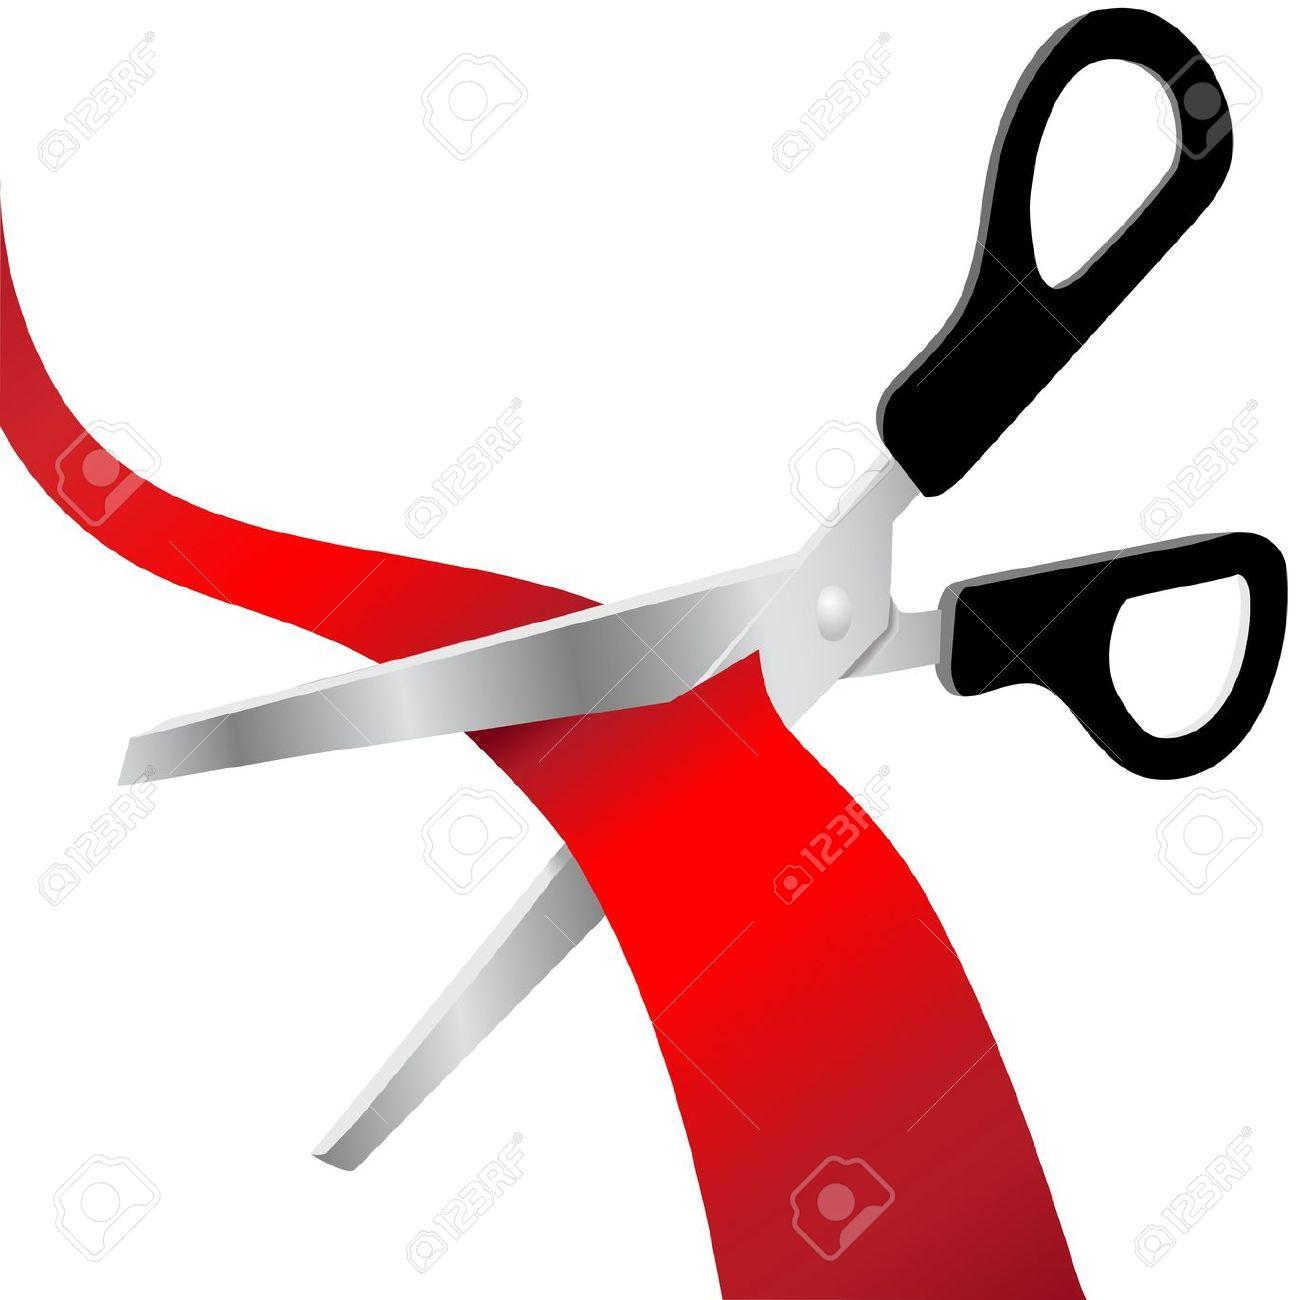 cut clipart clipground Grass-Cutting Logos Grass-Cutting Logos